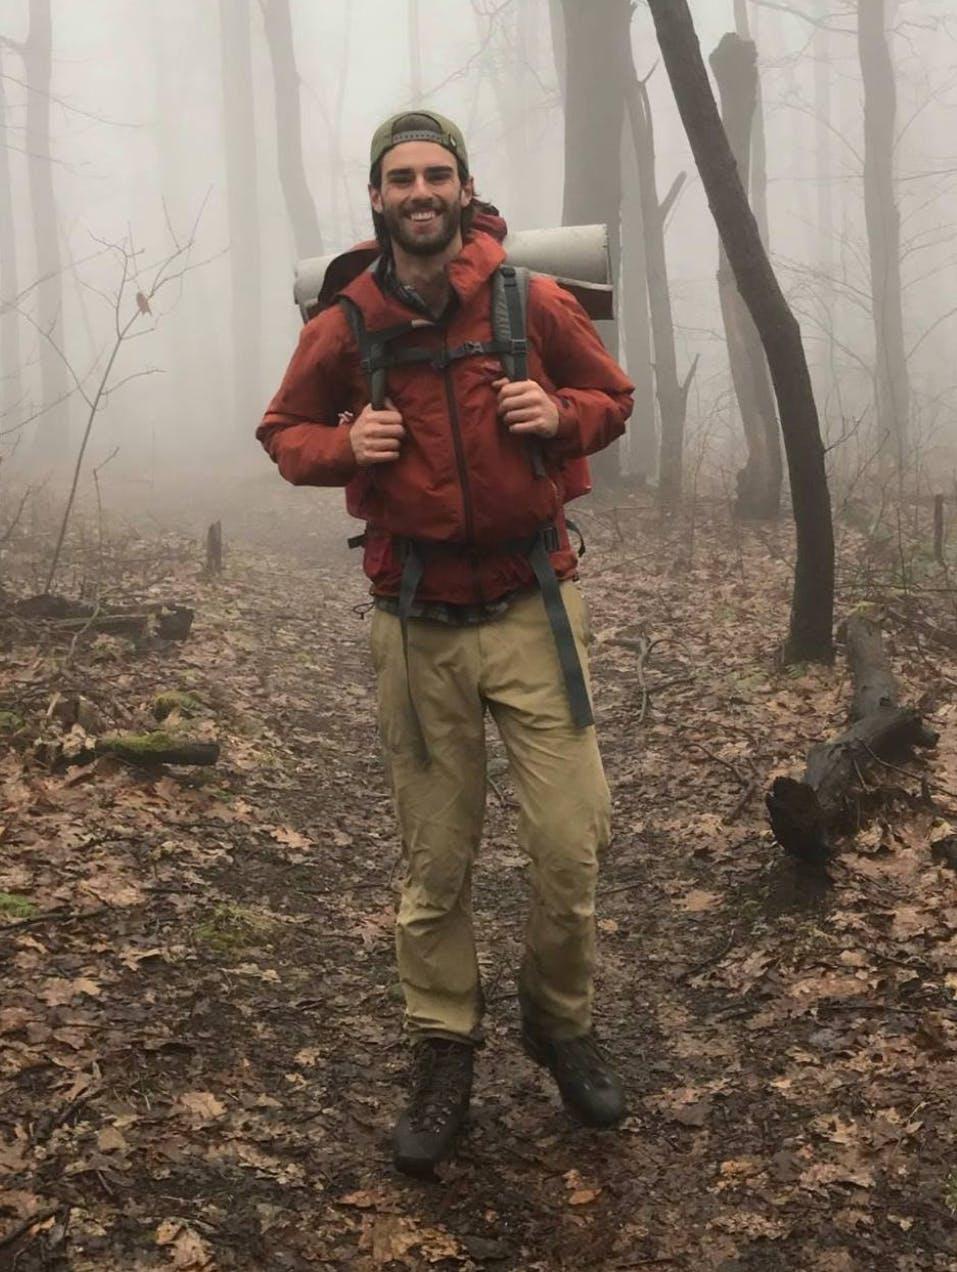 Camping & Hiking Expert Eric Bergdoll